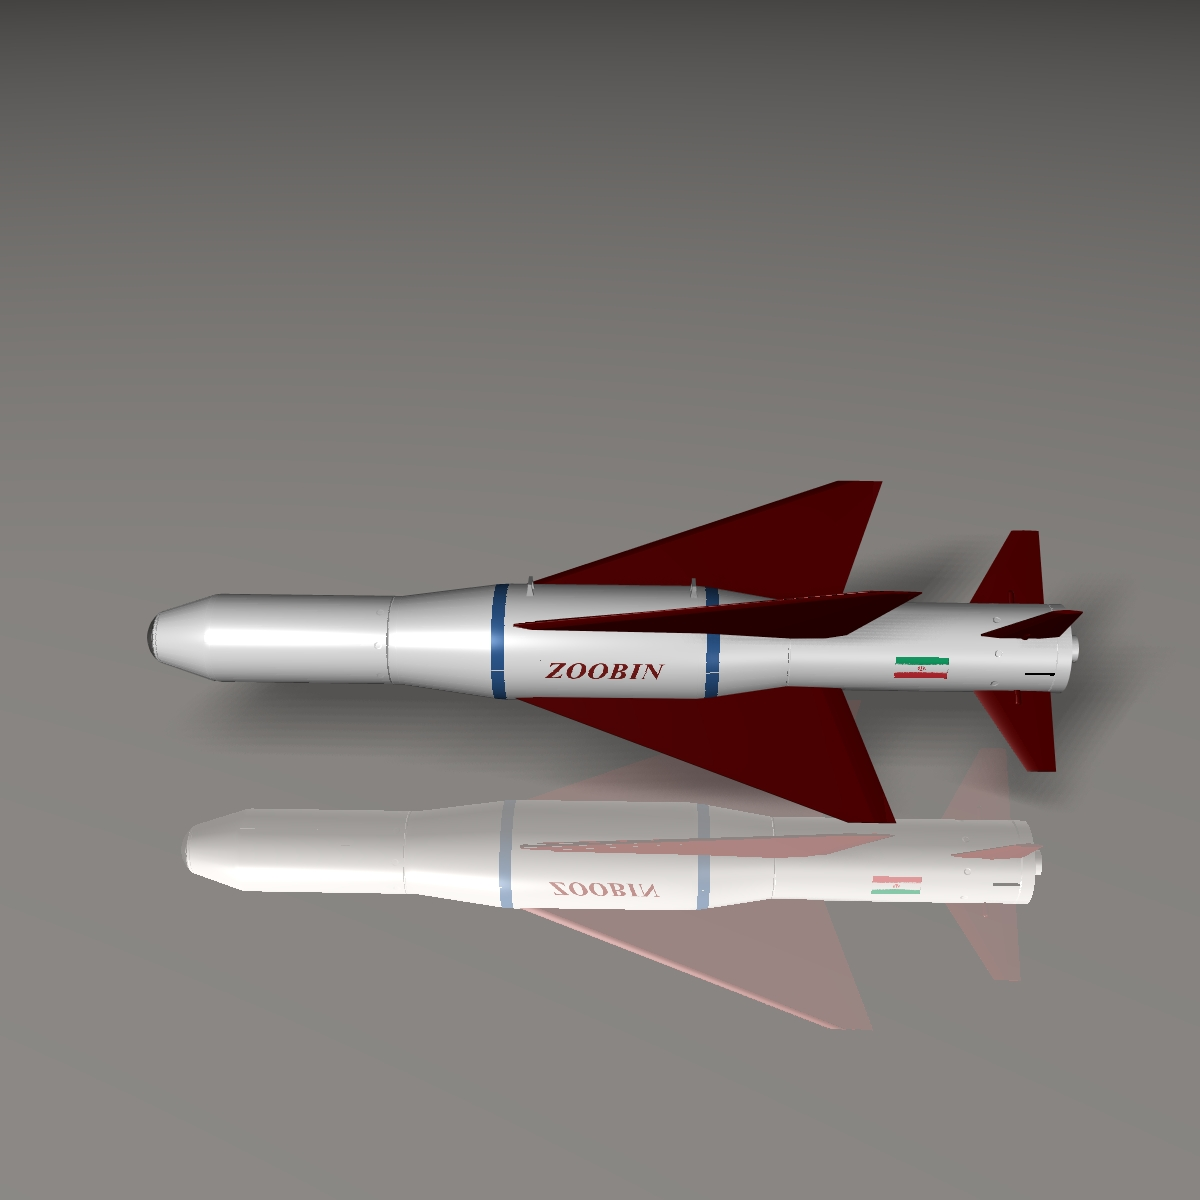 iranian agm-379 zoobin asm missile 3d model 3ds dxf fbx blend cob dae x obj 150590